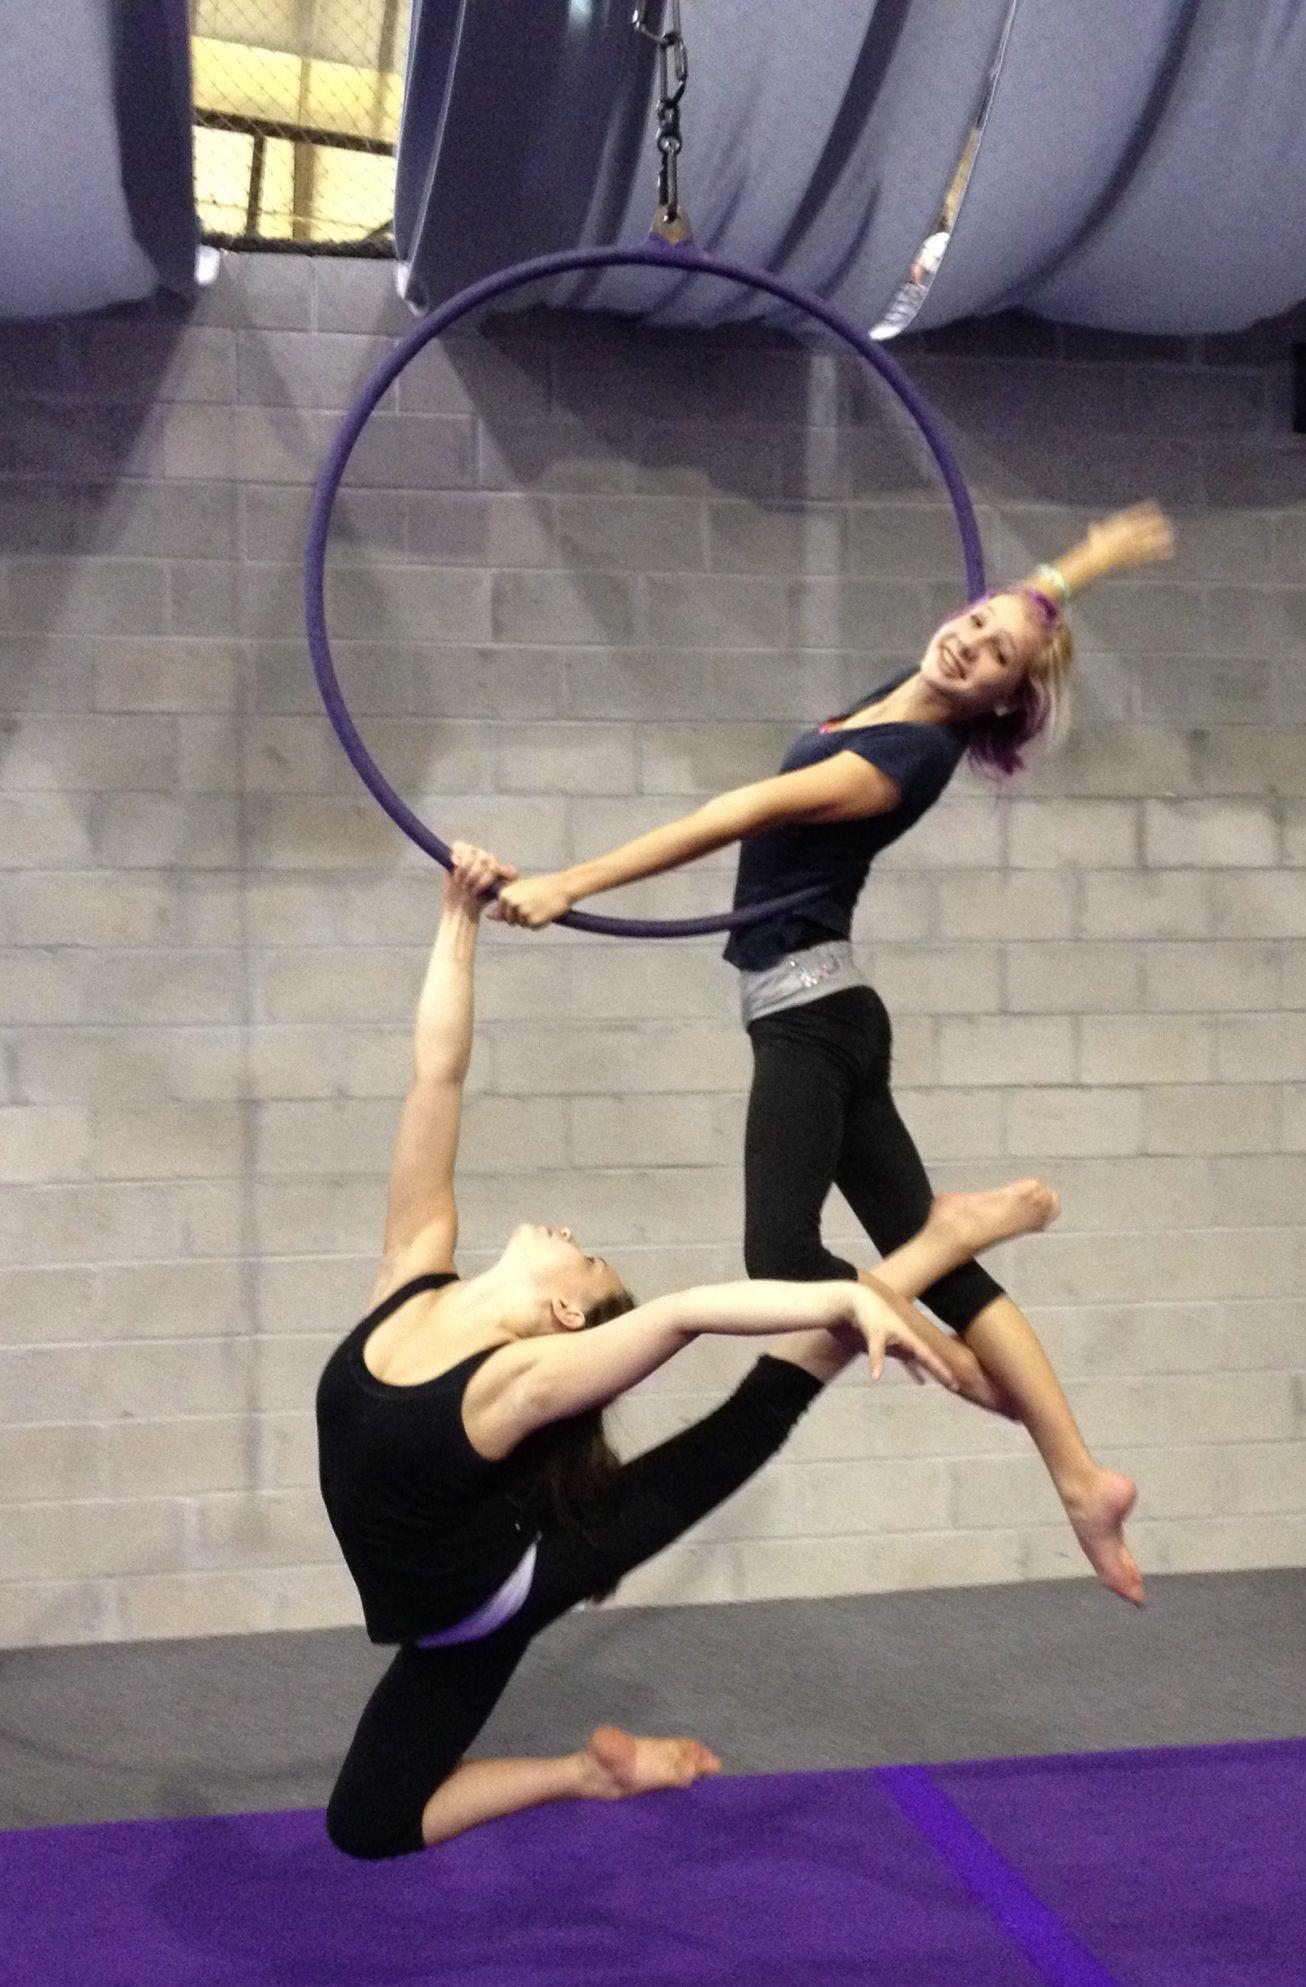 Cool Acro Tricks Acrobatic Arts